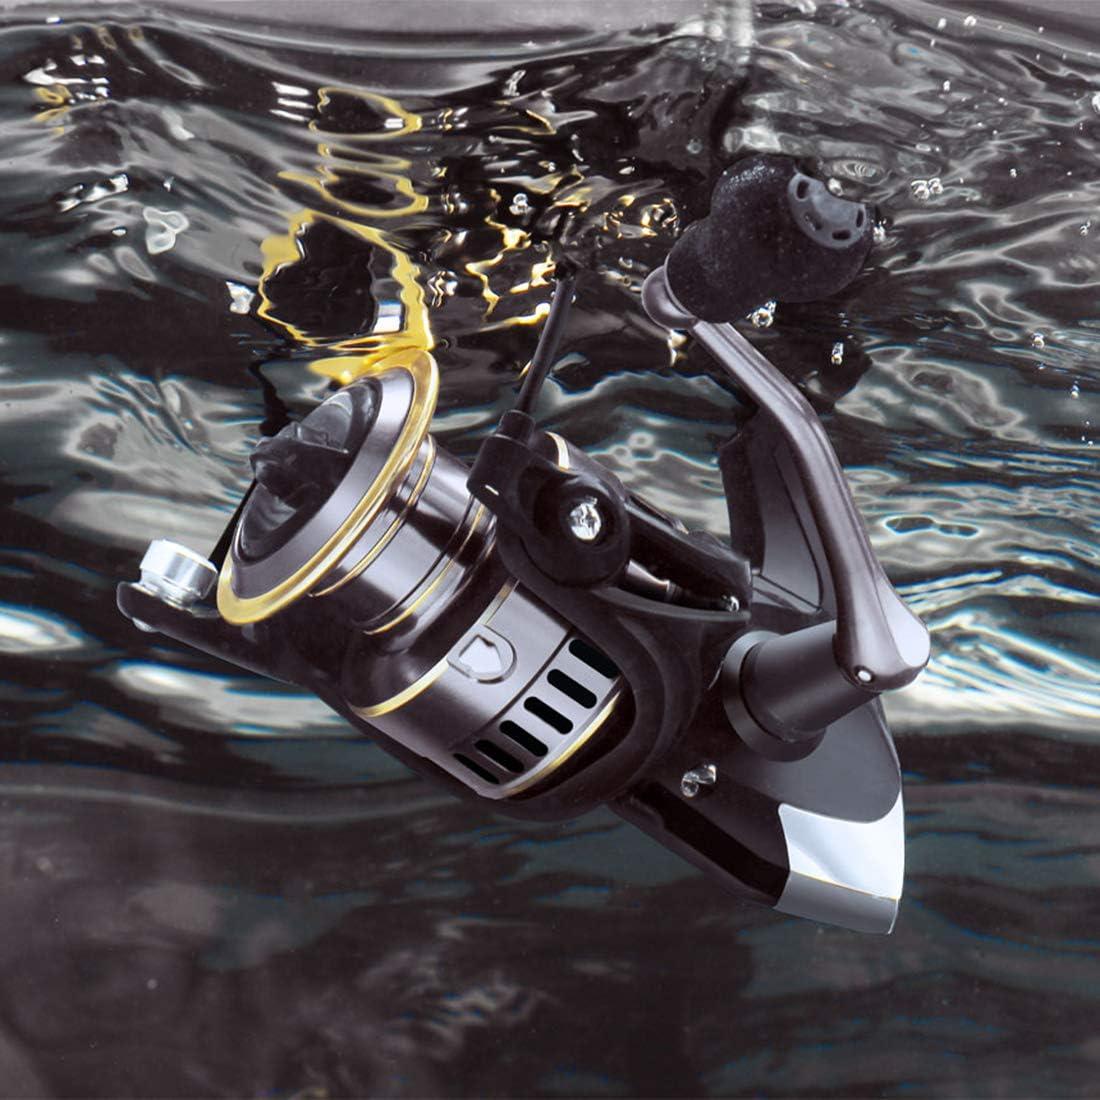 Carrete de pesca 5,2: 1, 10 kg, con rodamientos de larga duraci/ón y potente sistema de frenado para agua salada o agua dulce Baitcasting